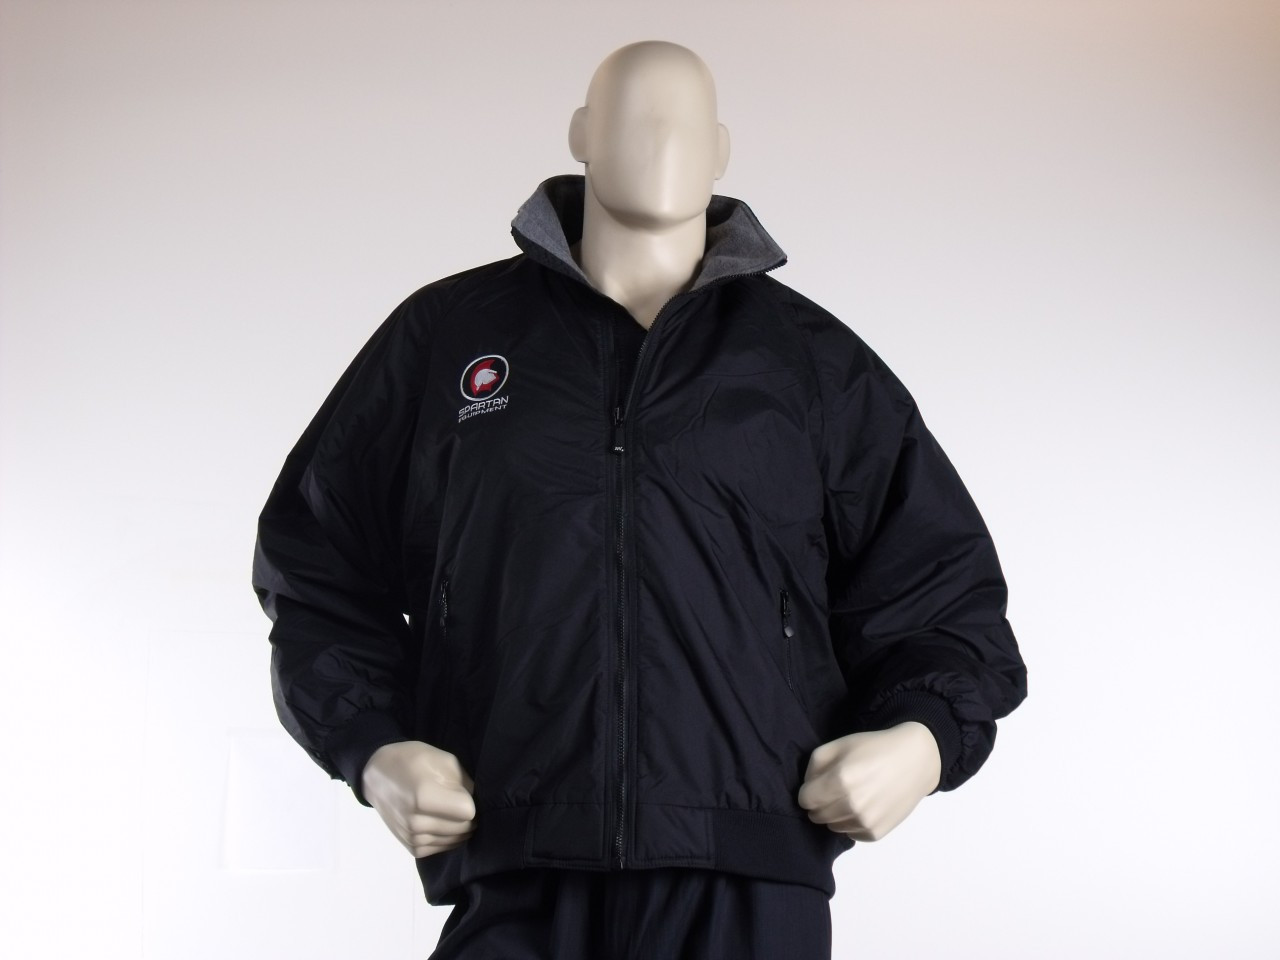 Spartan Equipment 365 Tough & Lite™ Jacket